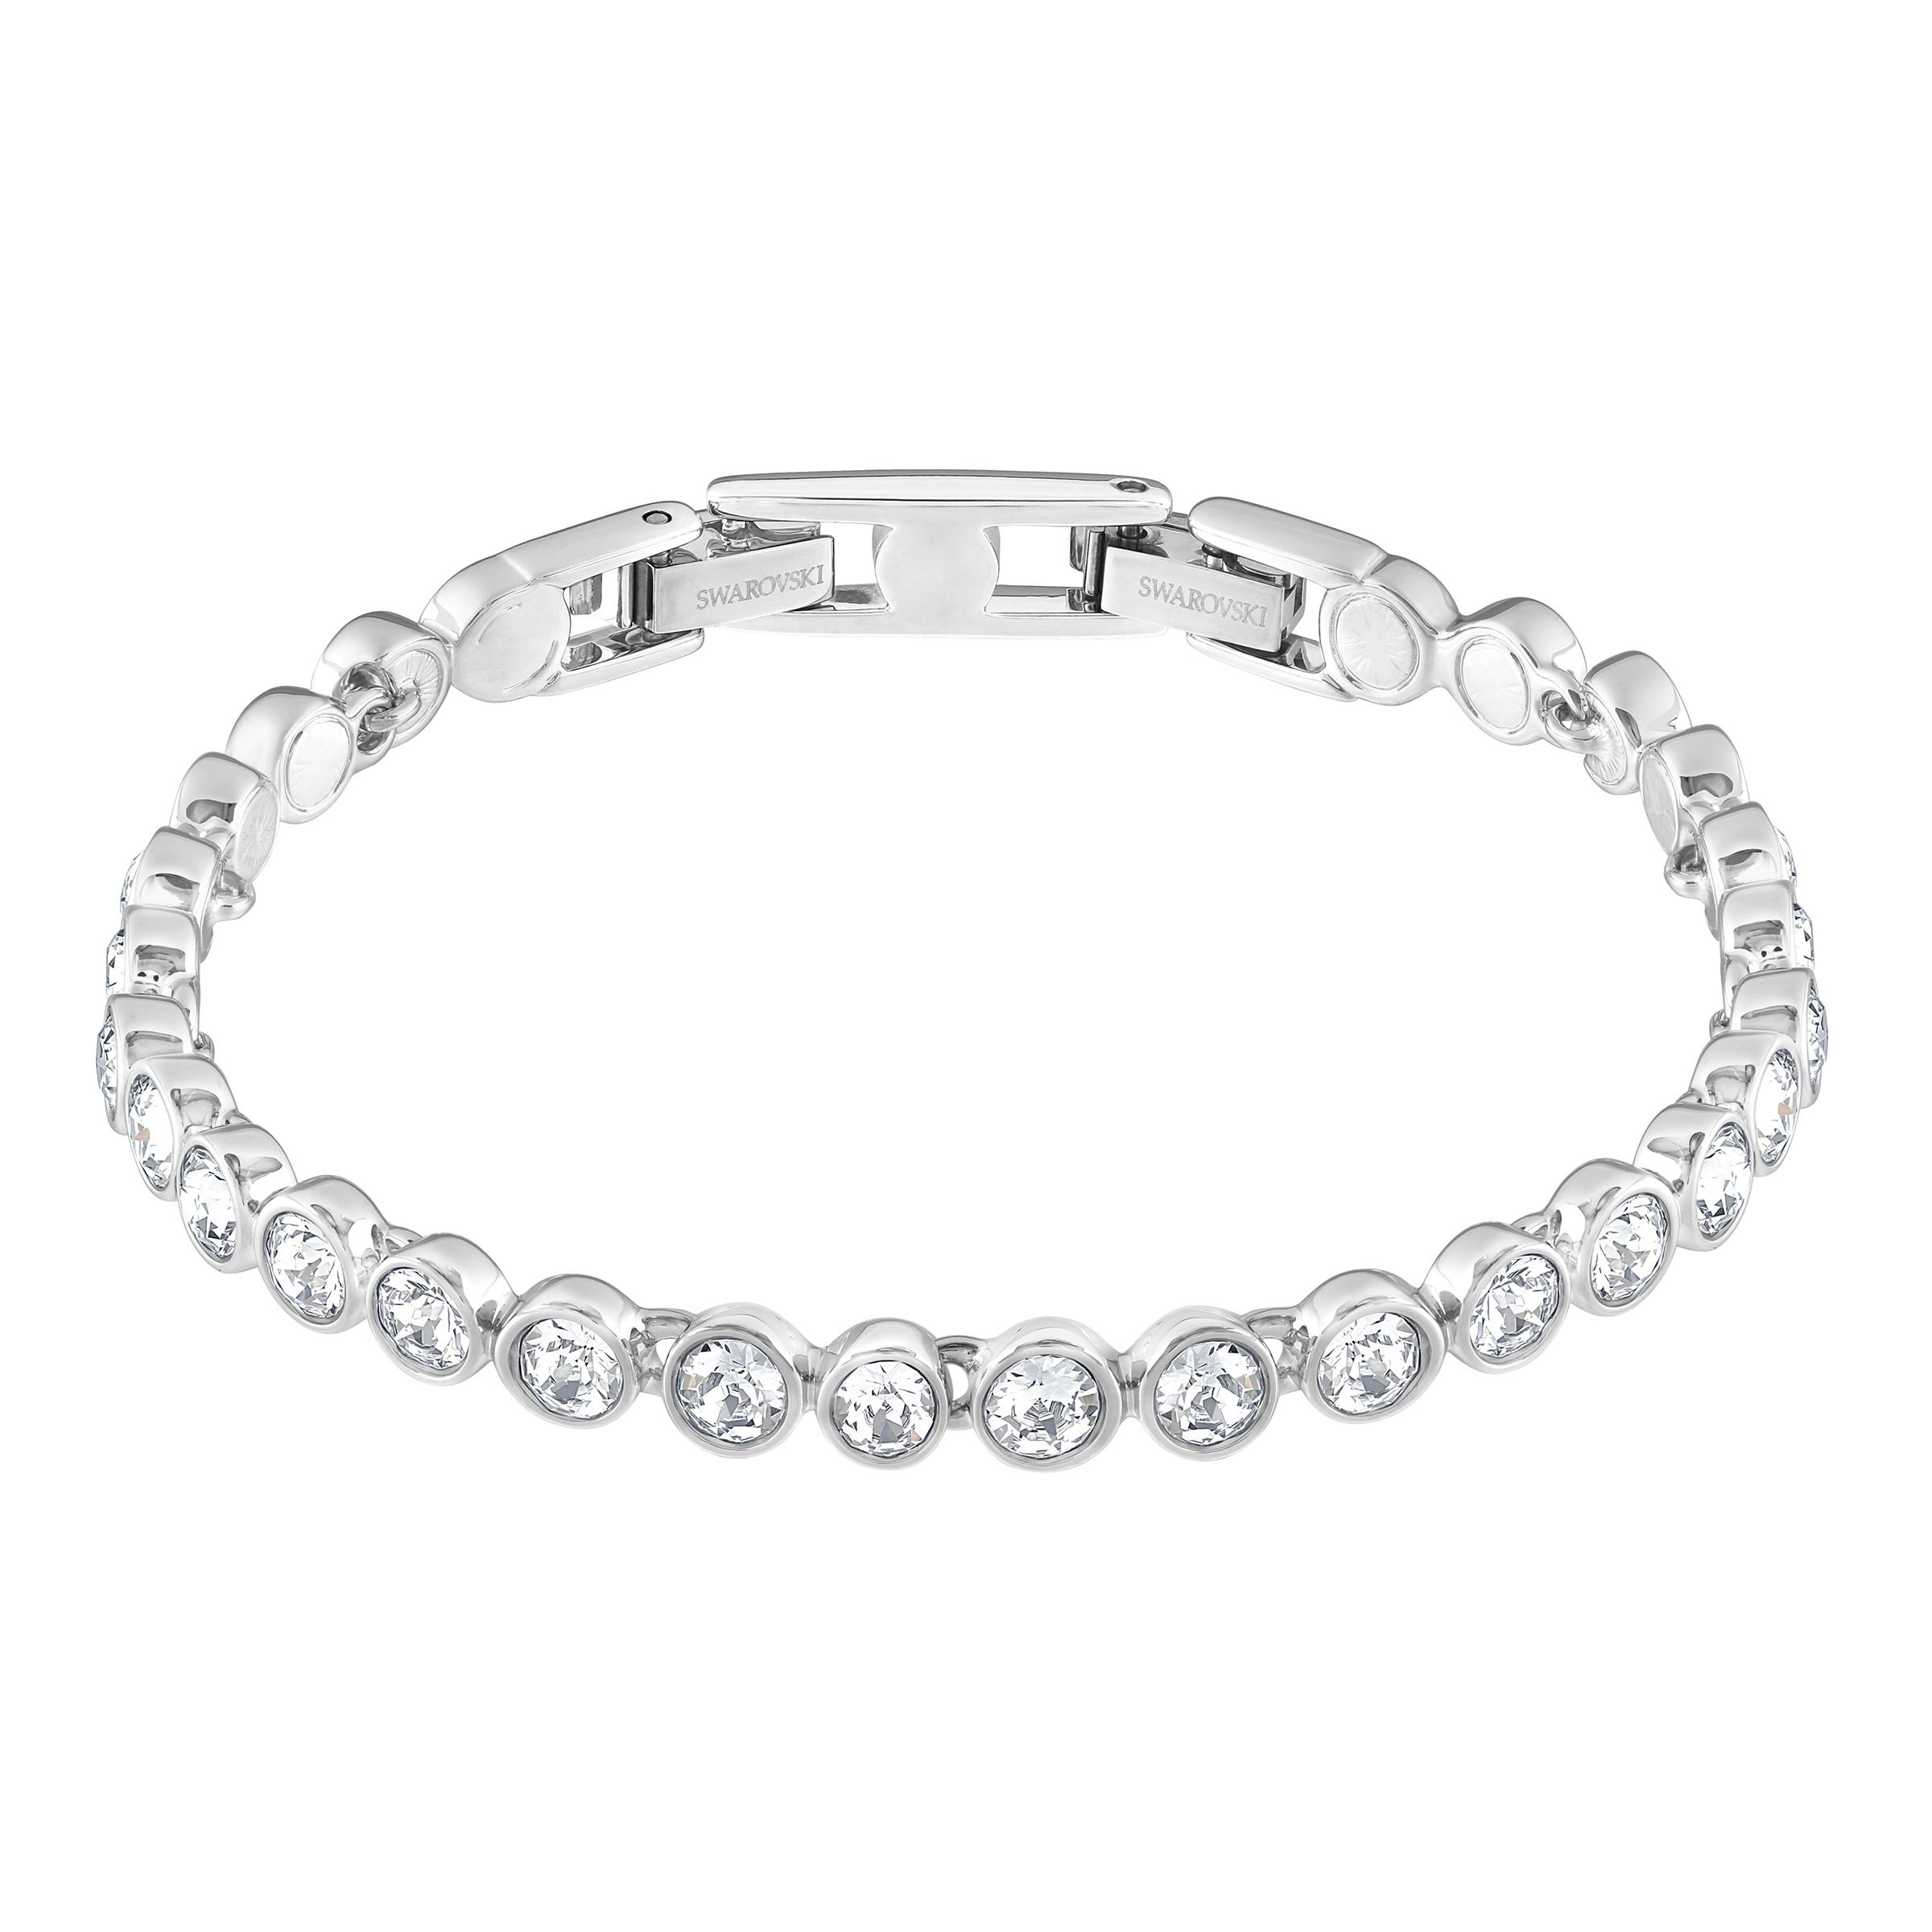 Tennis Bracelet, White, Rhodium Plated